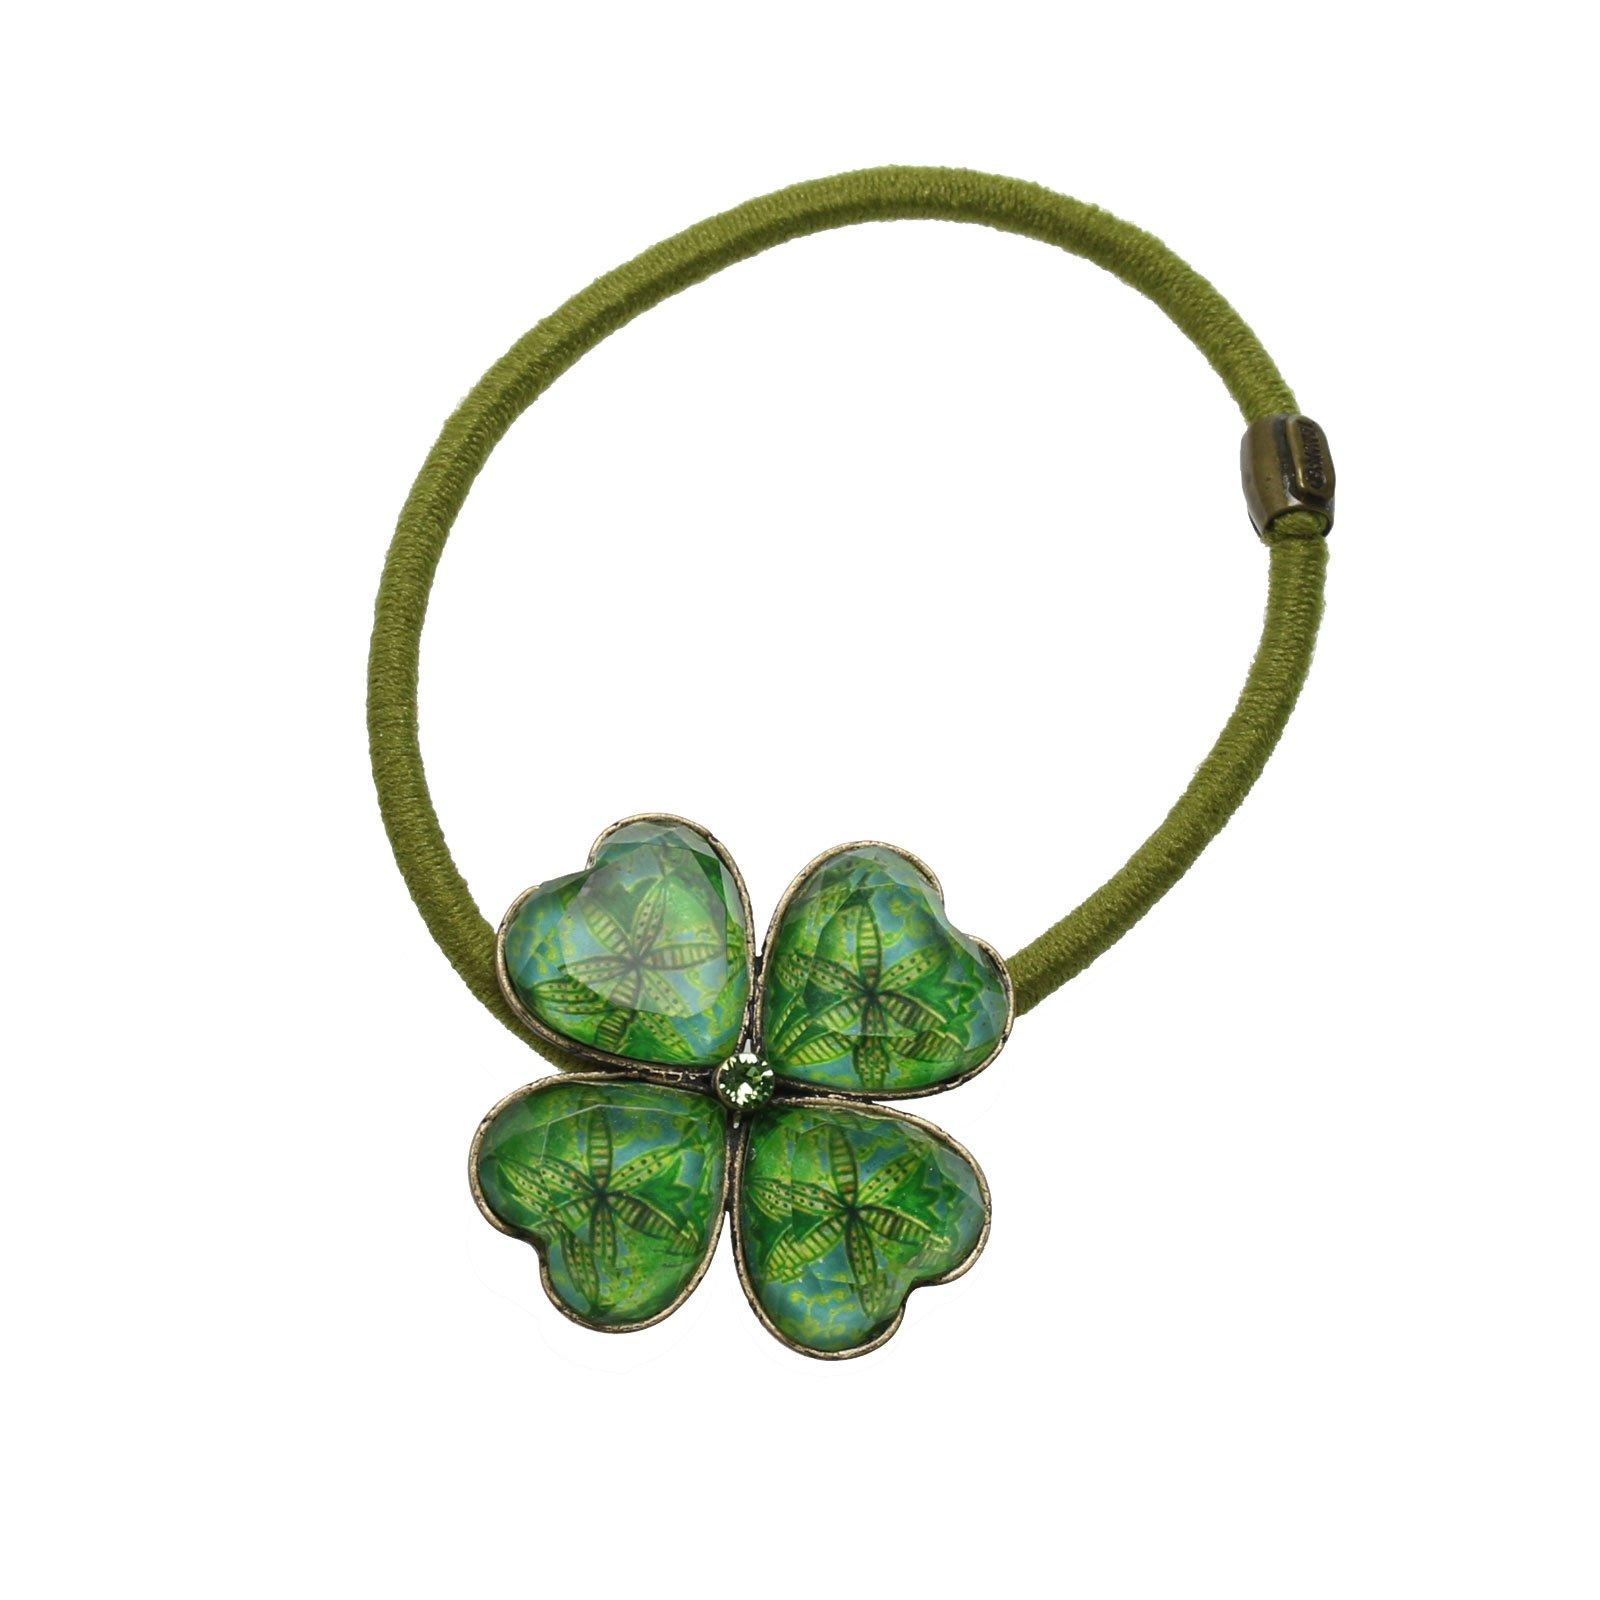 Tamarusan Green Lily Pattern Ponytail Holder Hand Made Nickel Free